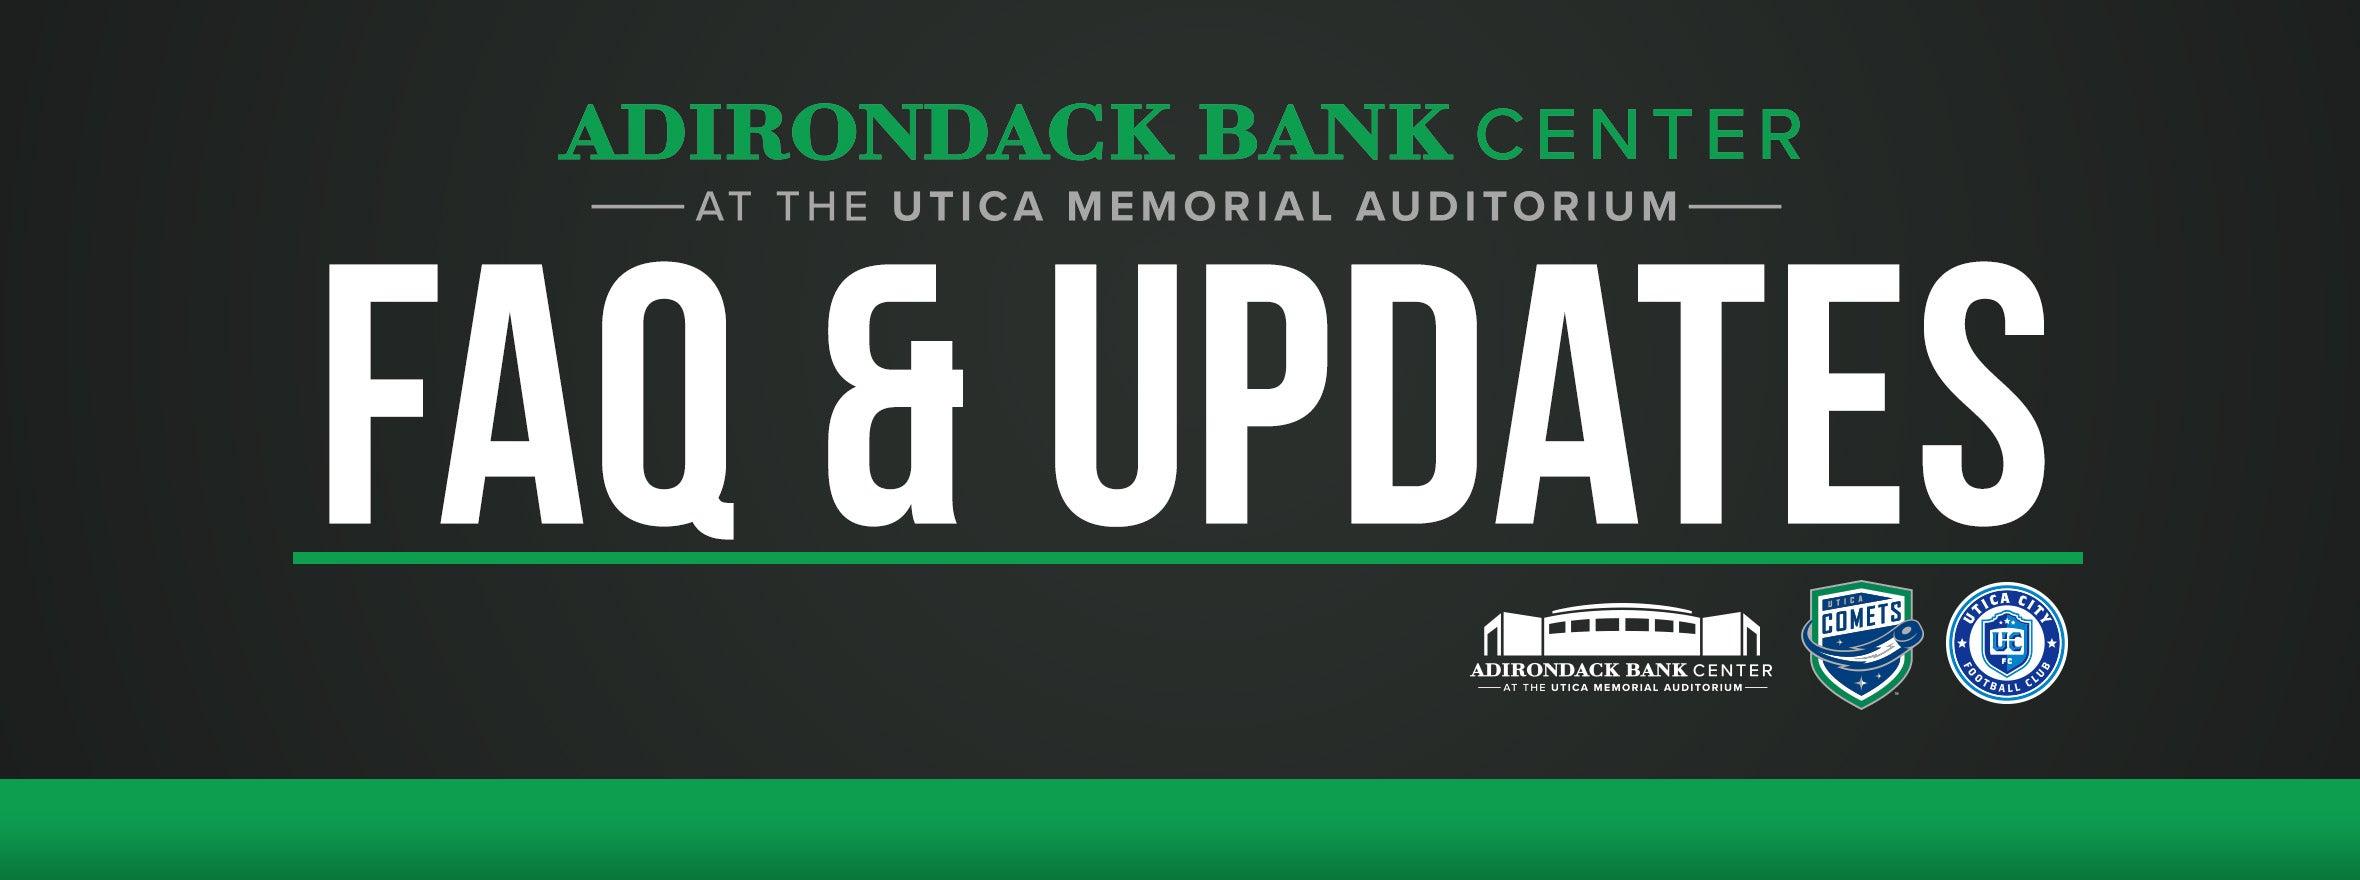 FAQ & Updates from the Adirondack Bank Center